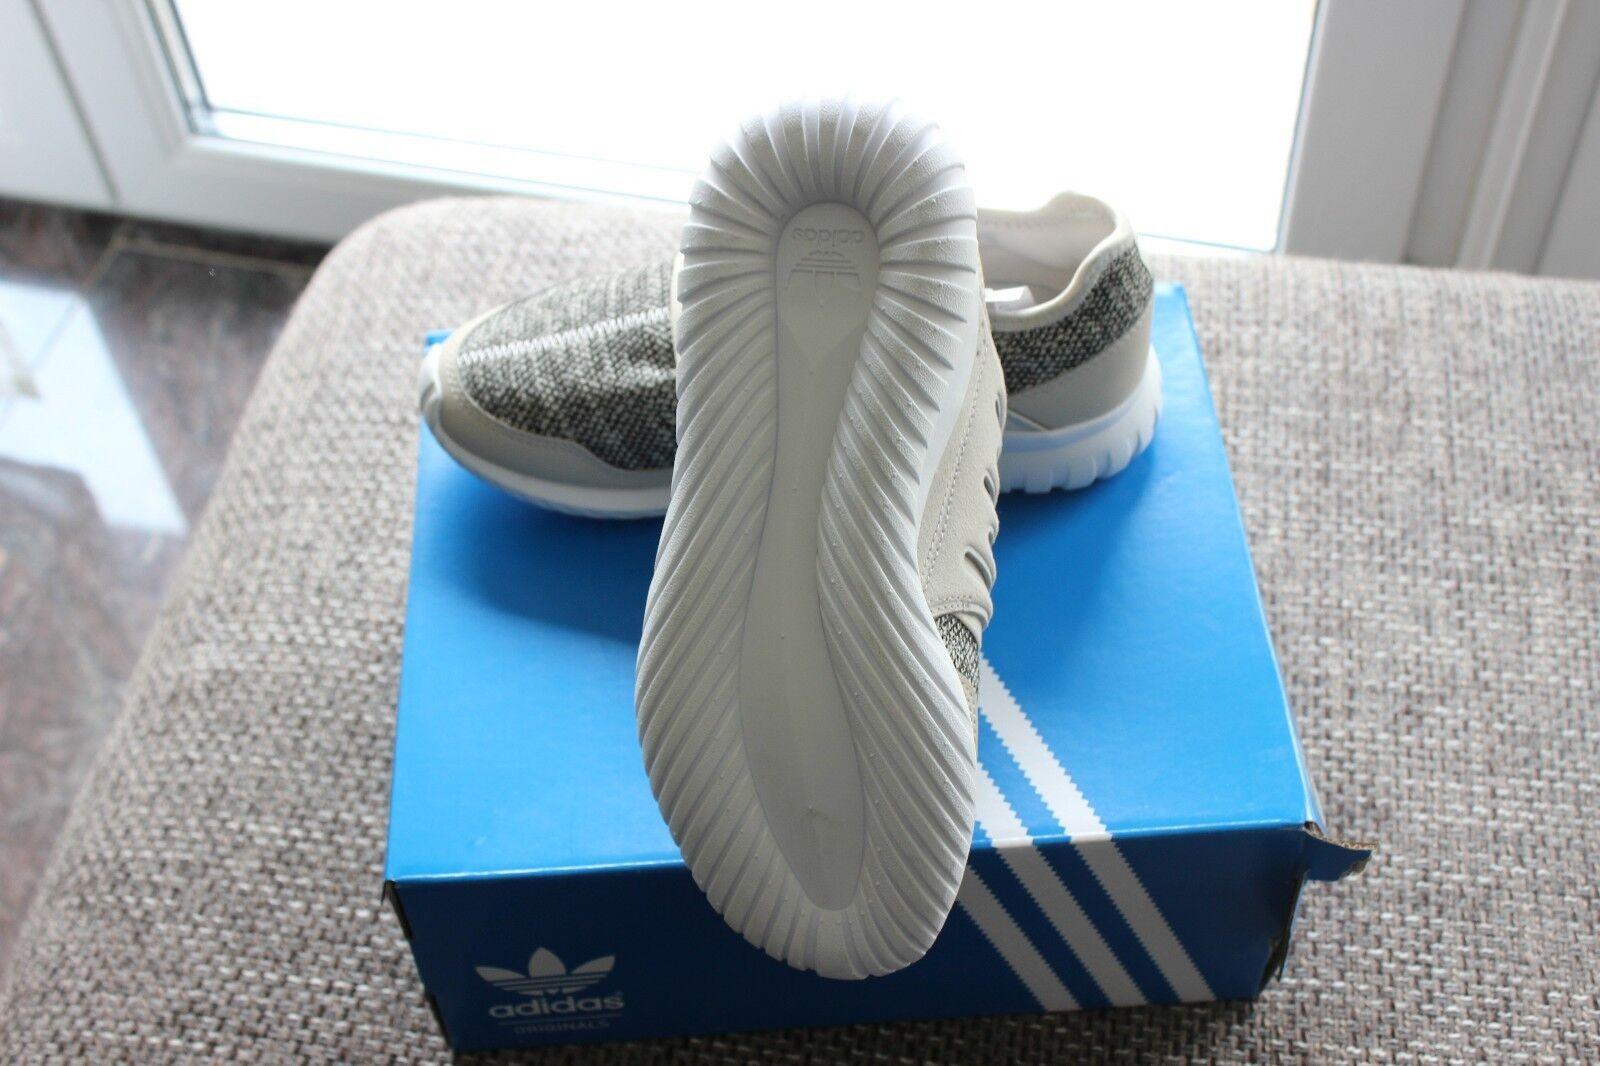 Adidas neu Tubular gr 37 Sportschuhe neu Adidas Damenschuhe 318e6c